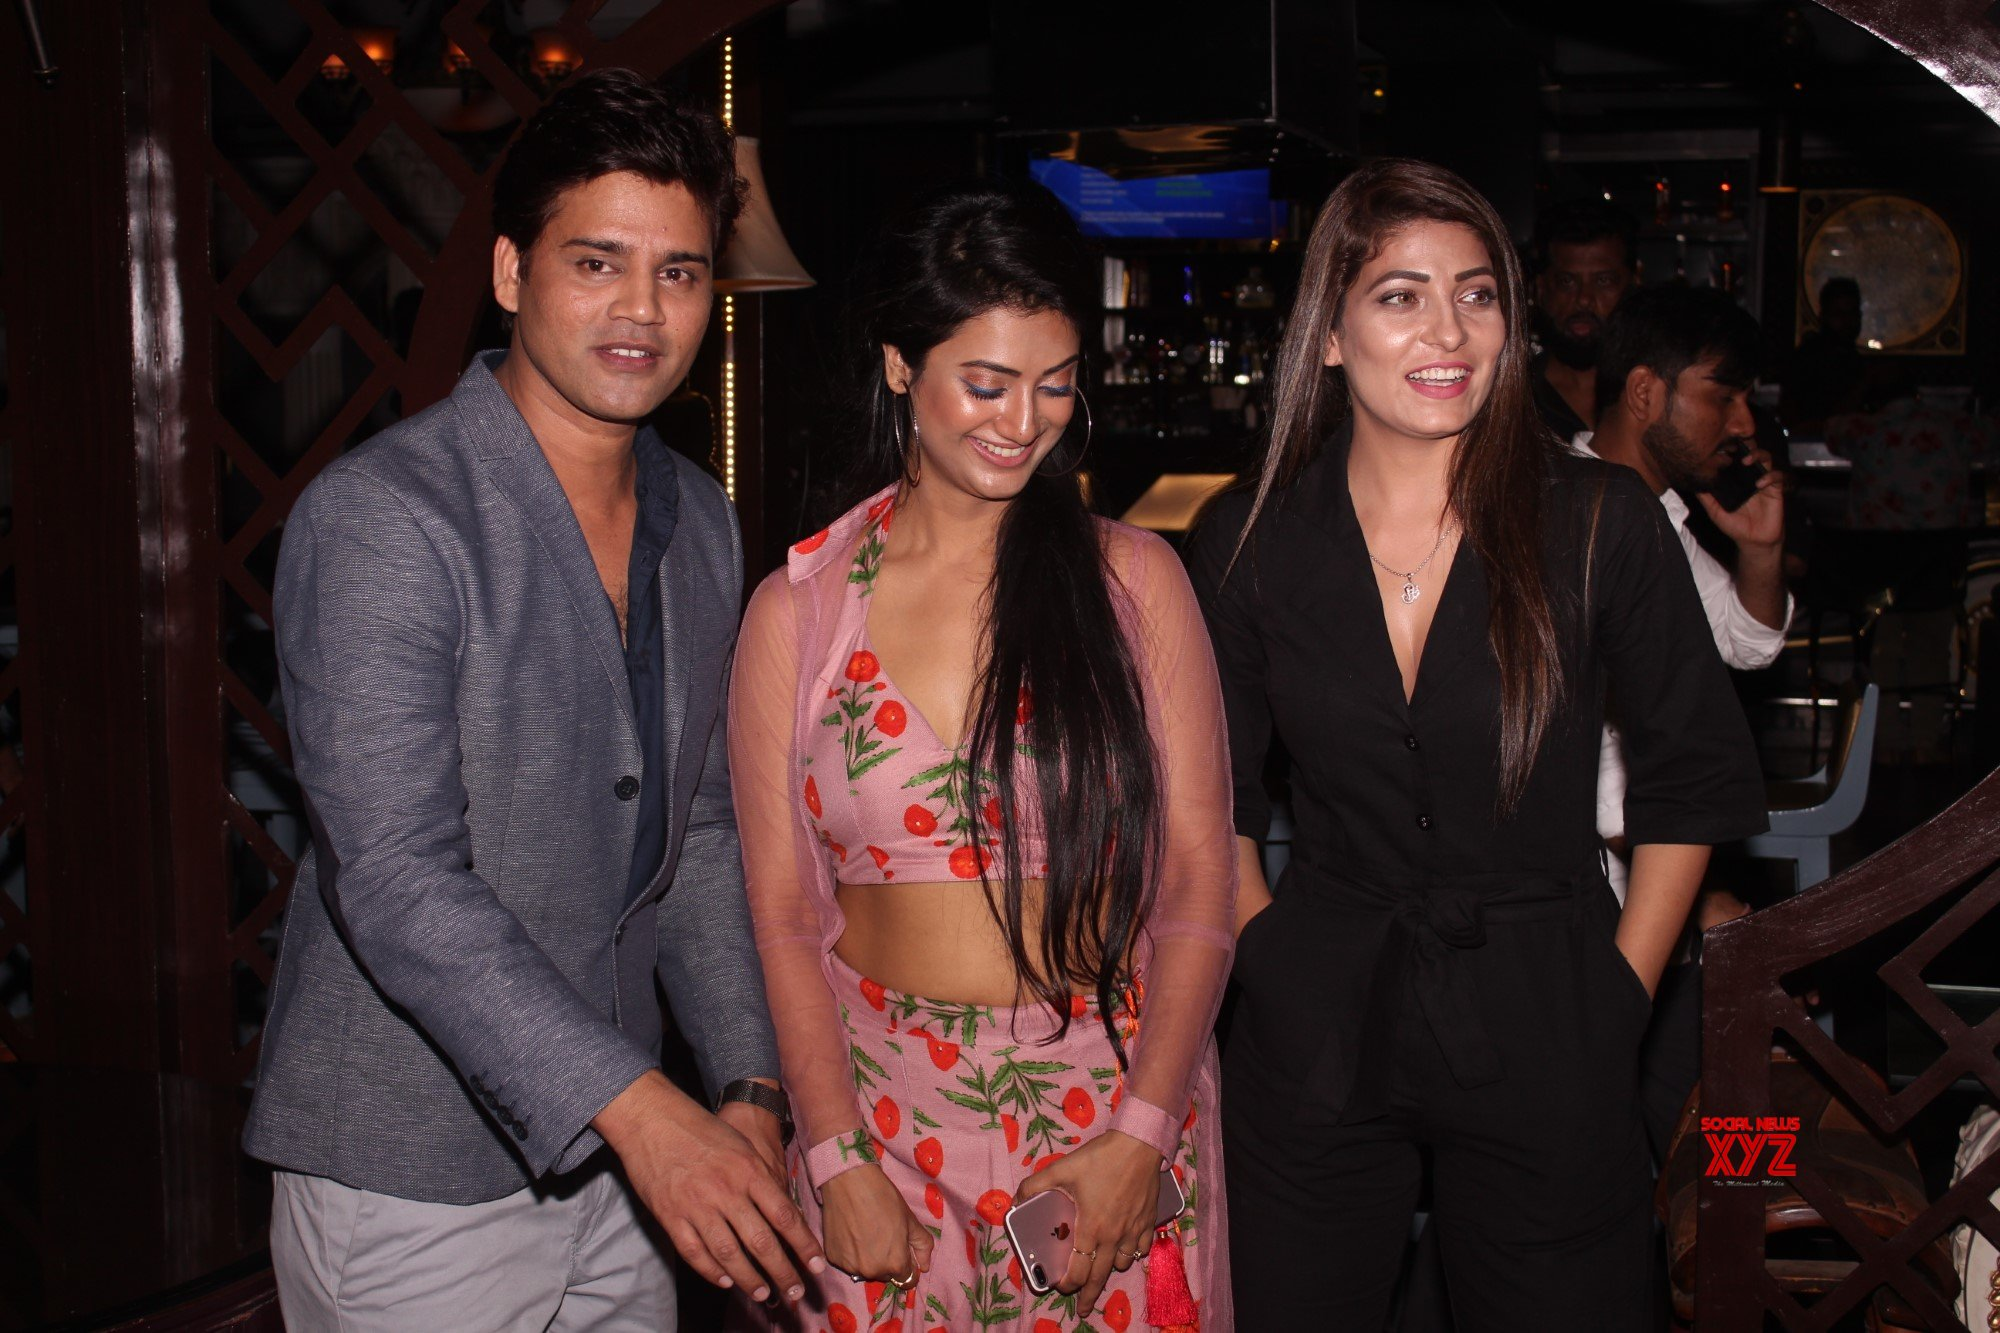 Mimoh Chakraborty, Monty Sharma, Jayveer Panghaal, Nikita Soni, Muzahid Khan, And Ankita Thakur At Sorry I Am Late Movie Announcement